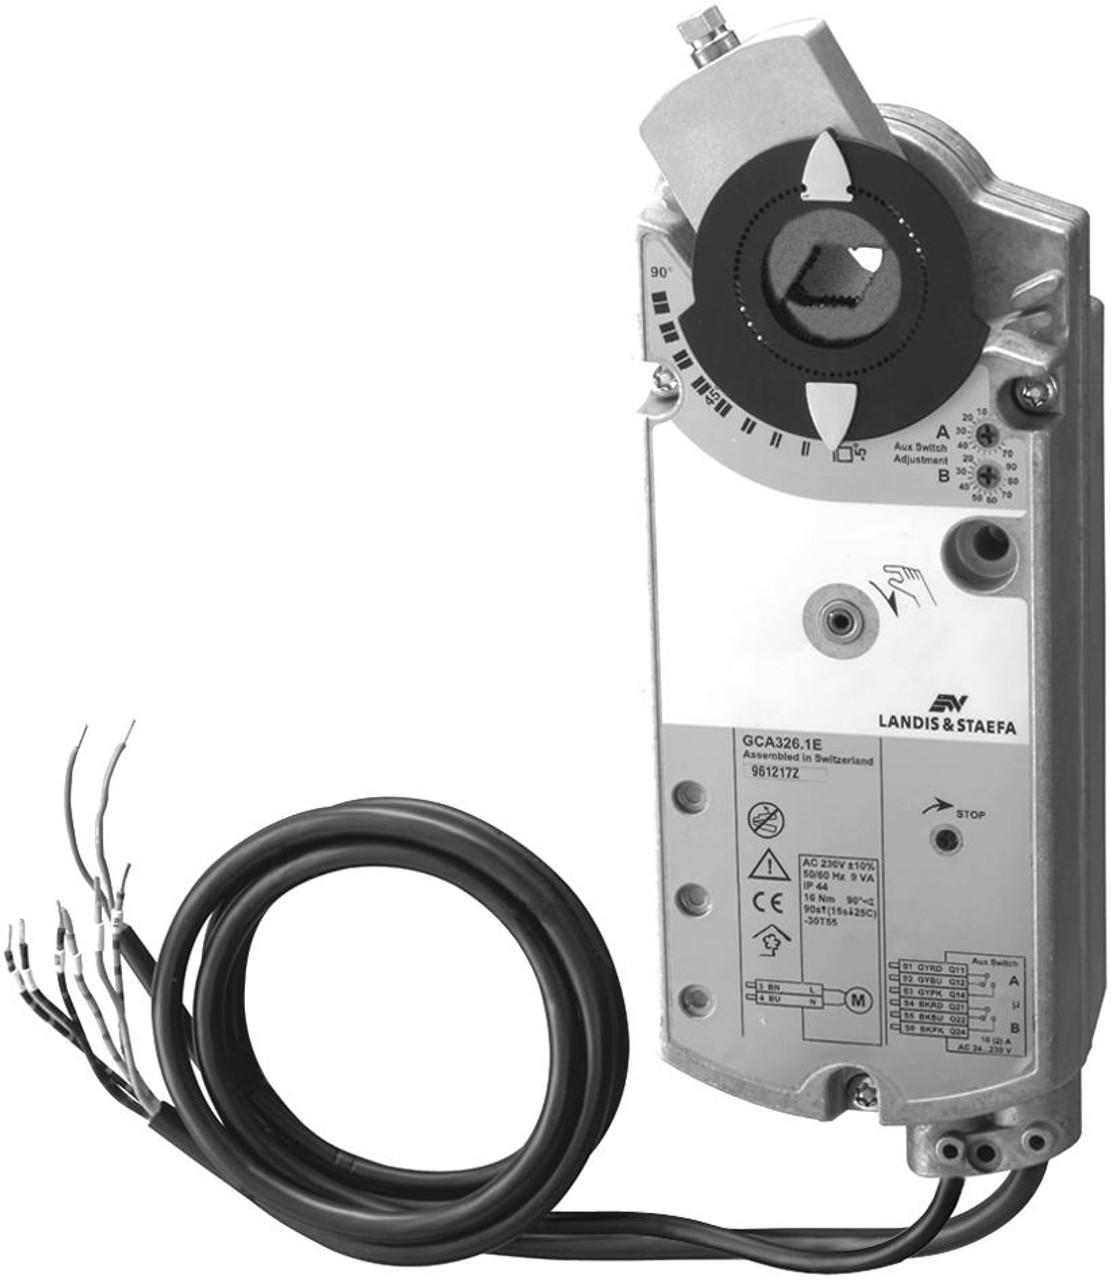 GCA126.1E rotary air damper actuator